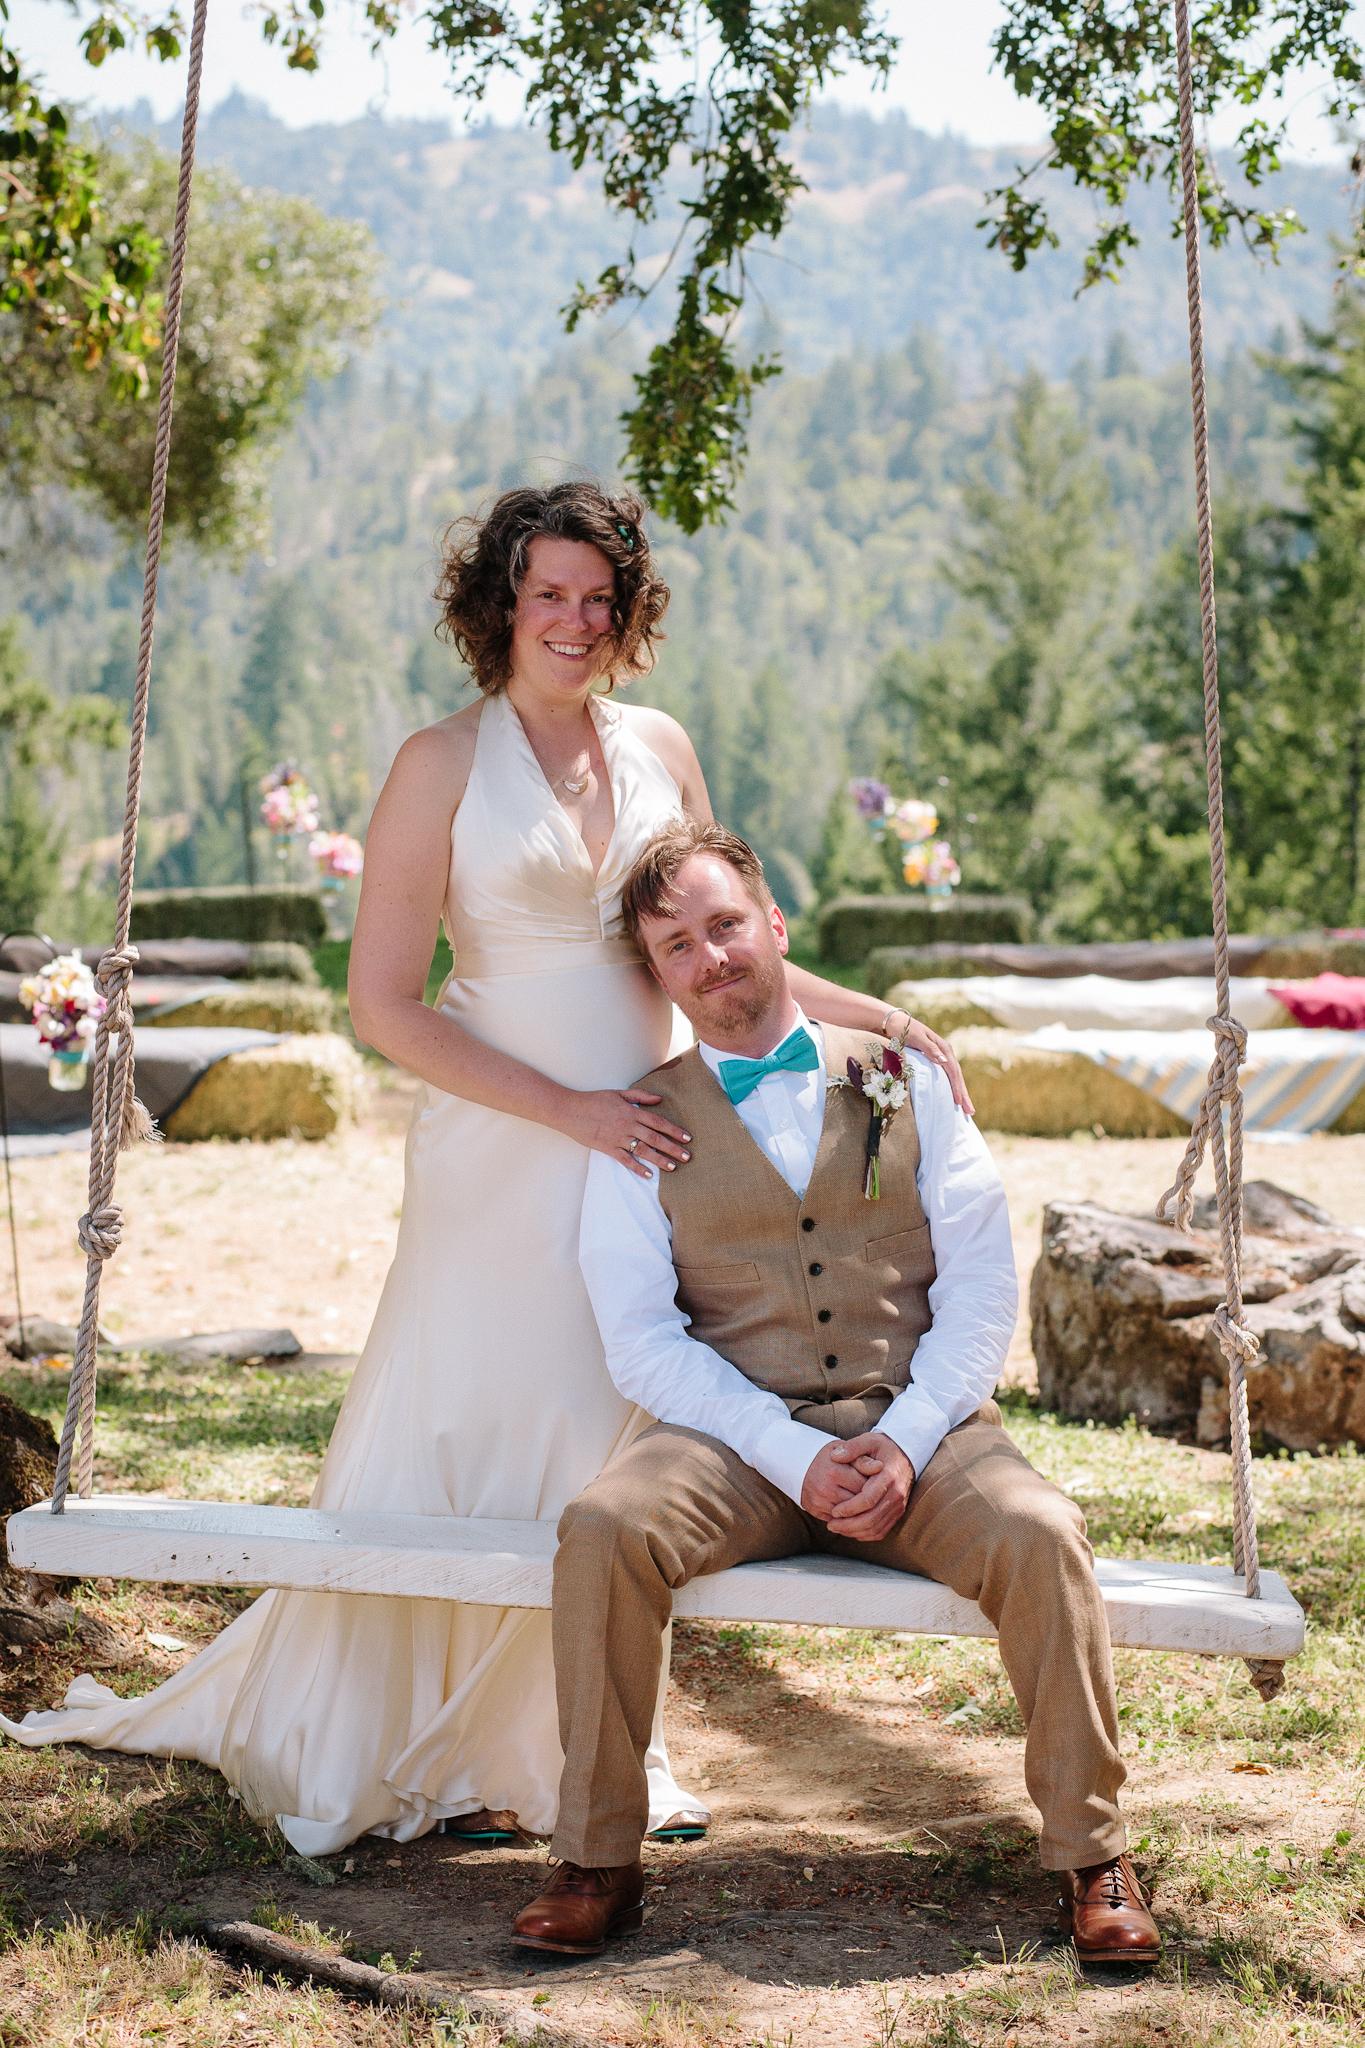 crystalchristiaan_weddingsneakpeek_2014_jenniferleahyphotography-8-of-43_14139982850_o.jpg